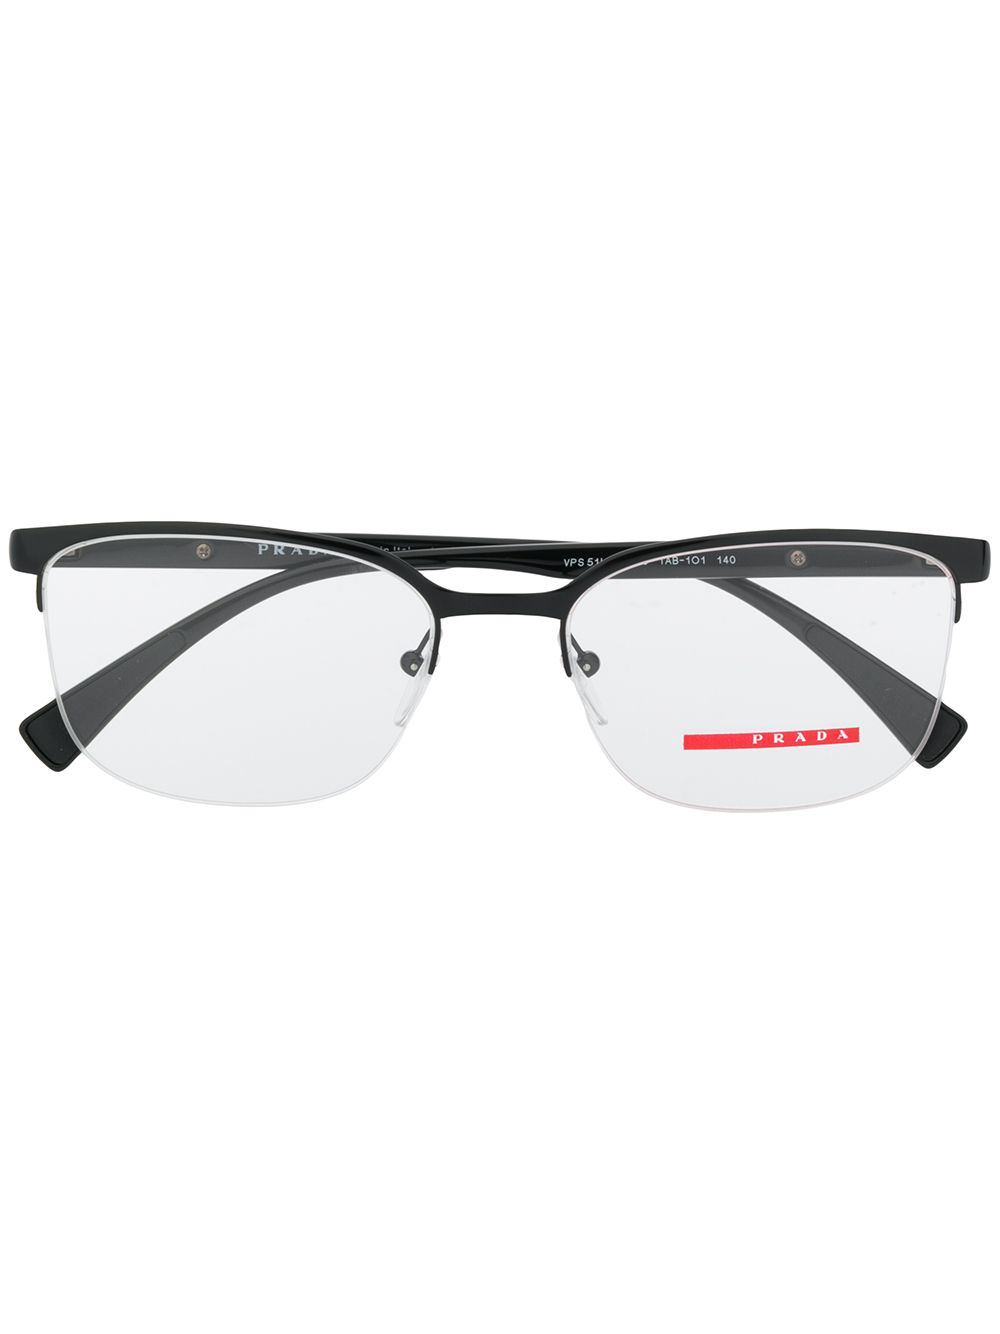 966ace0666a Prada Frames Glasses - Best Glasses Cnapracticetesting.Com 2018